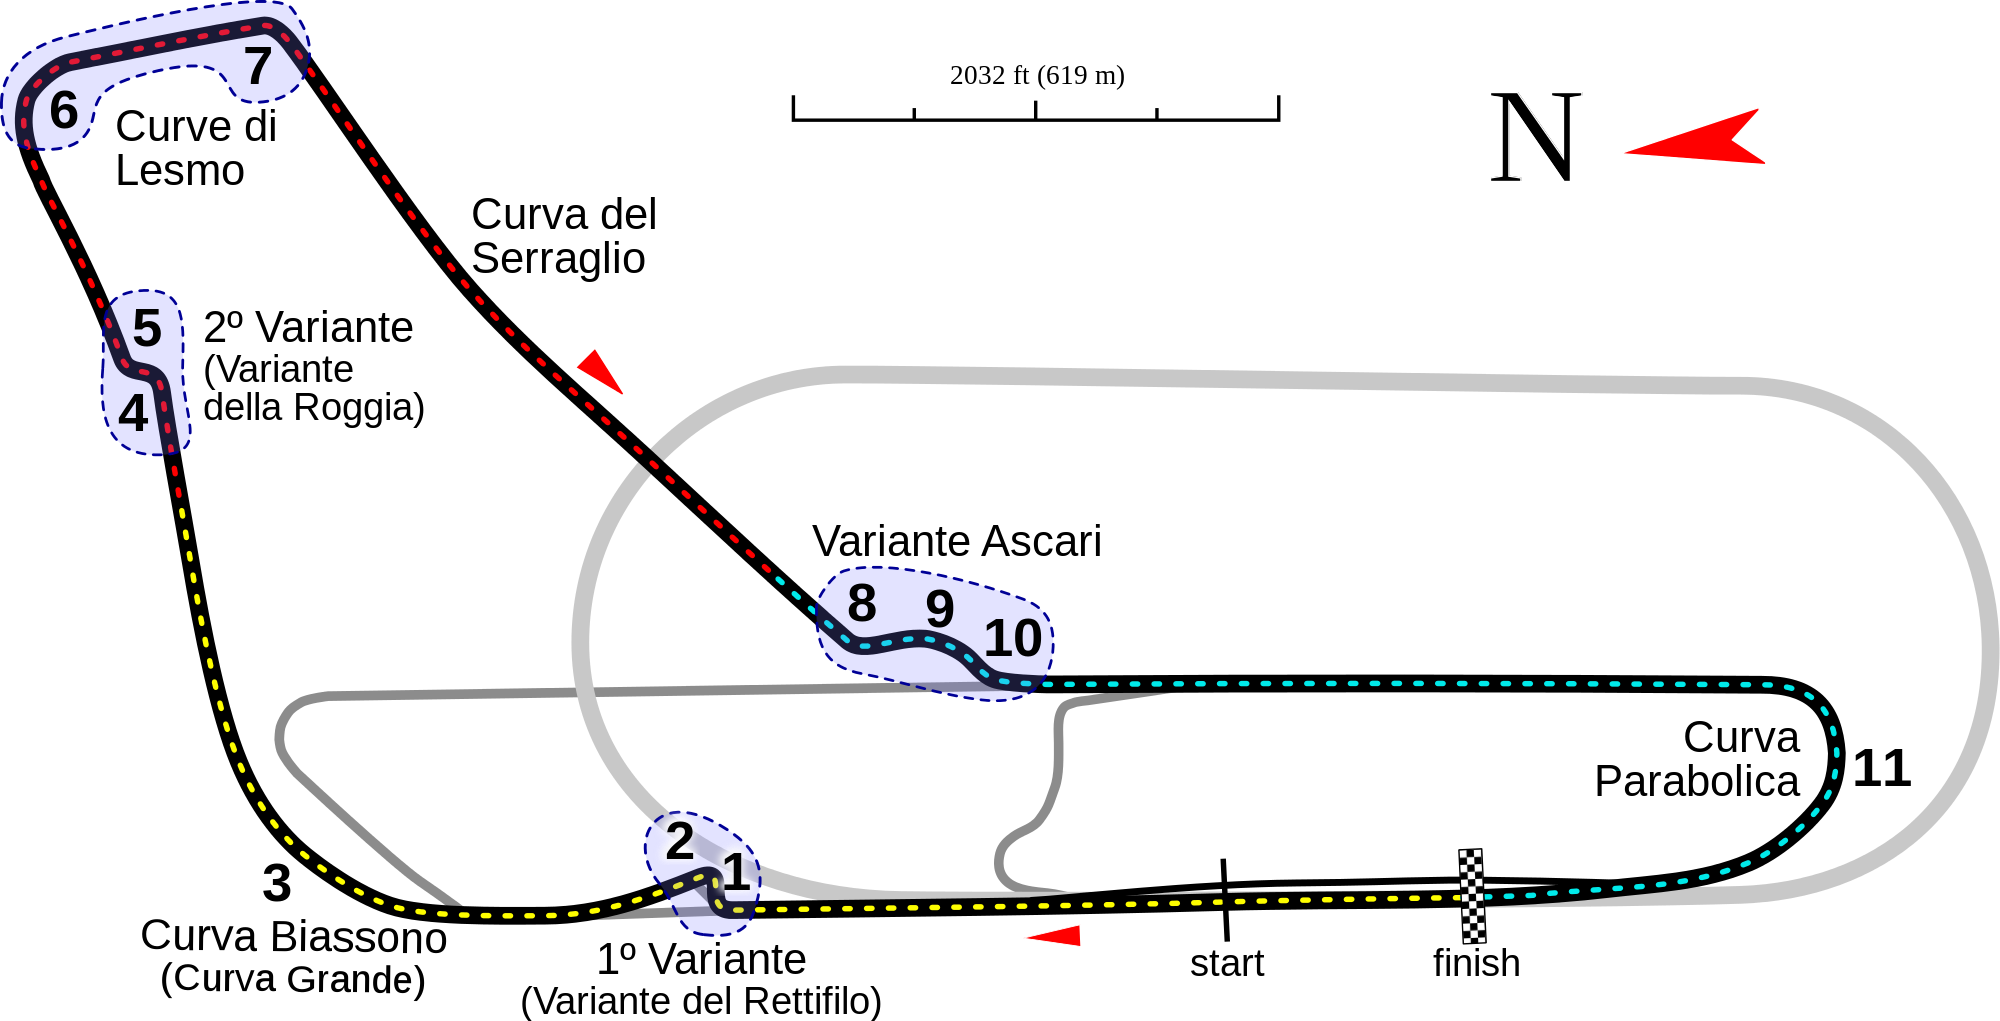 Pcars_Monza_GP.png